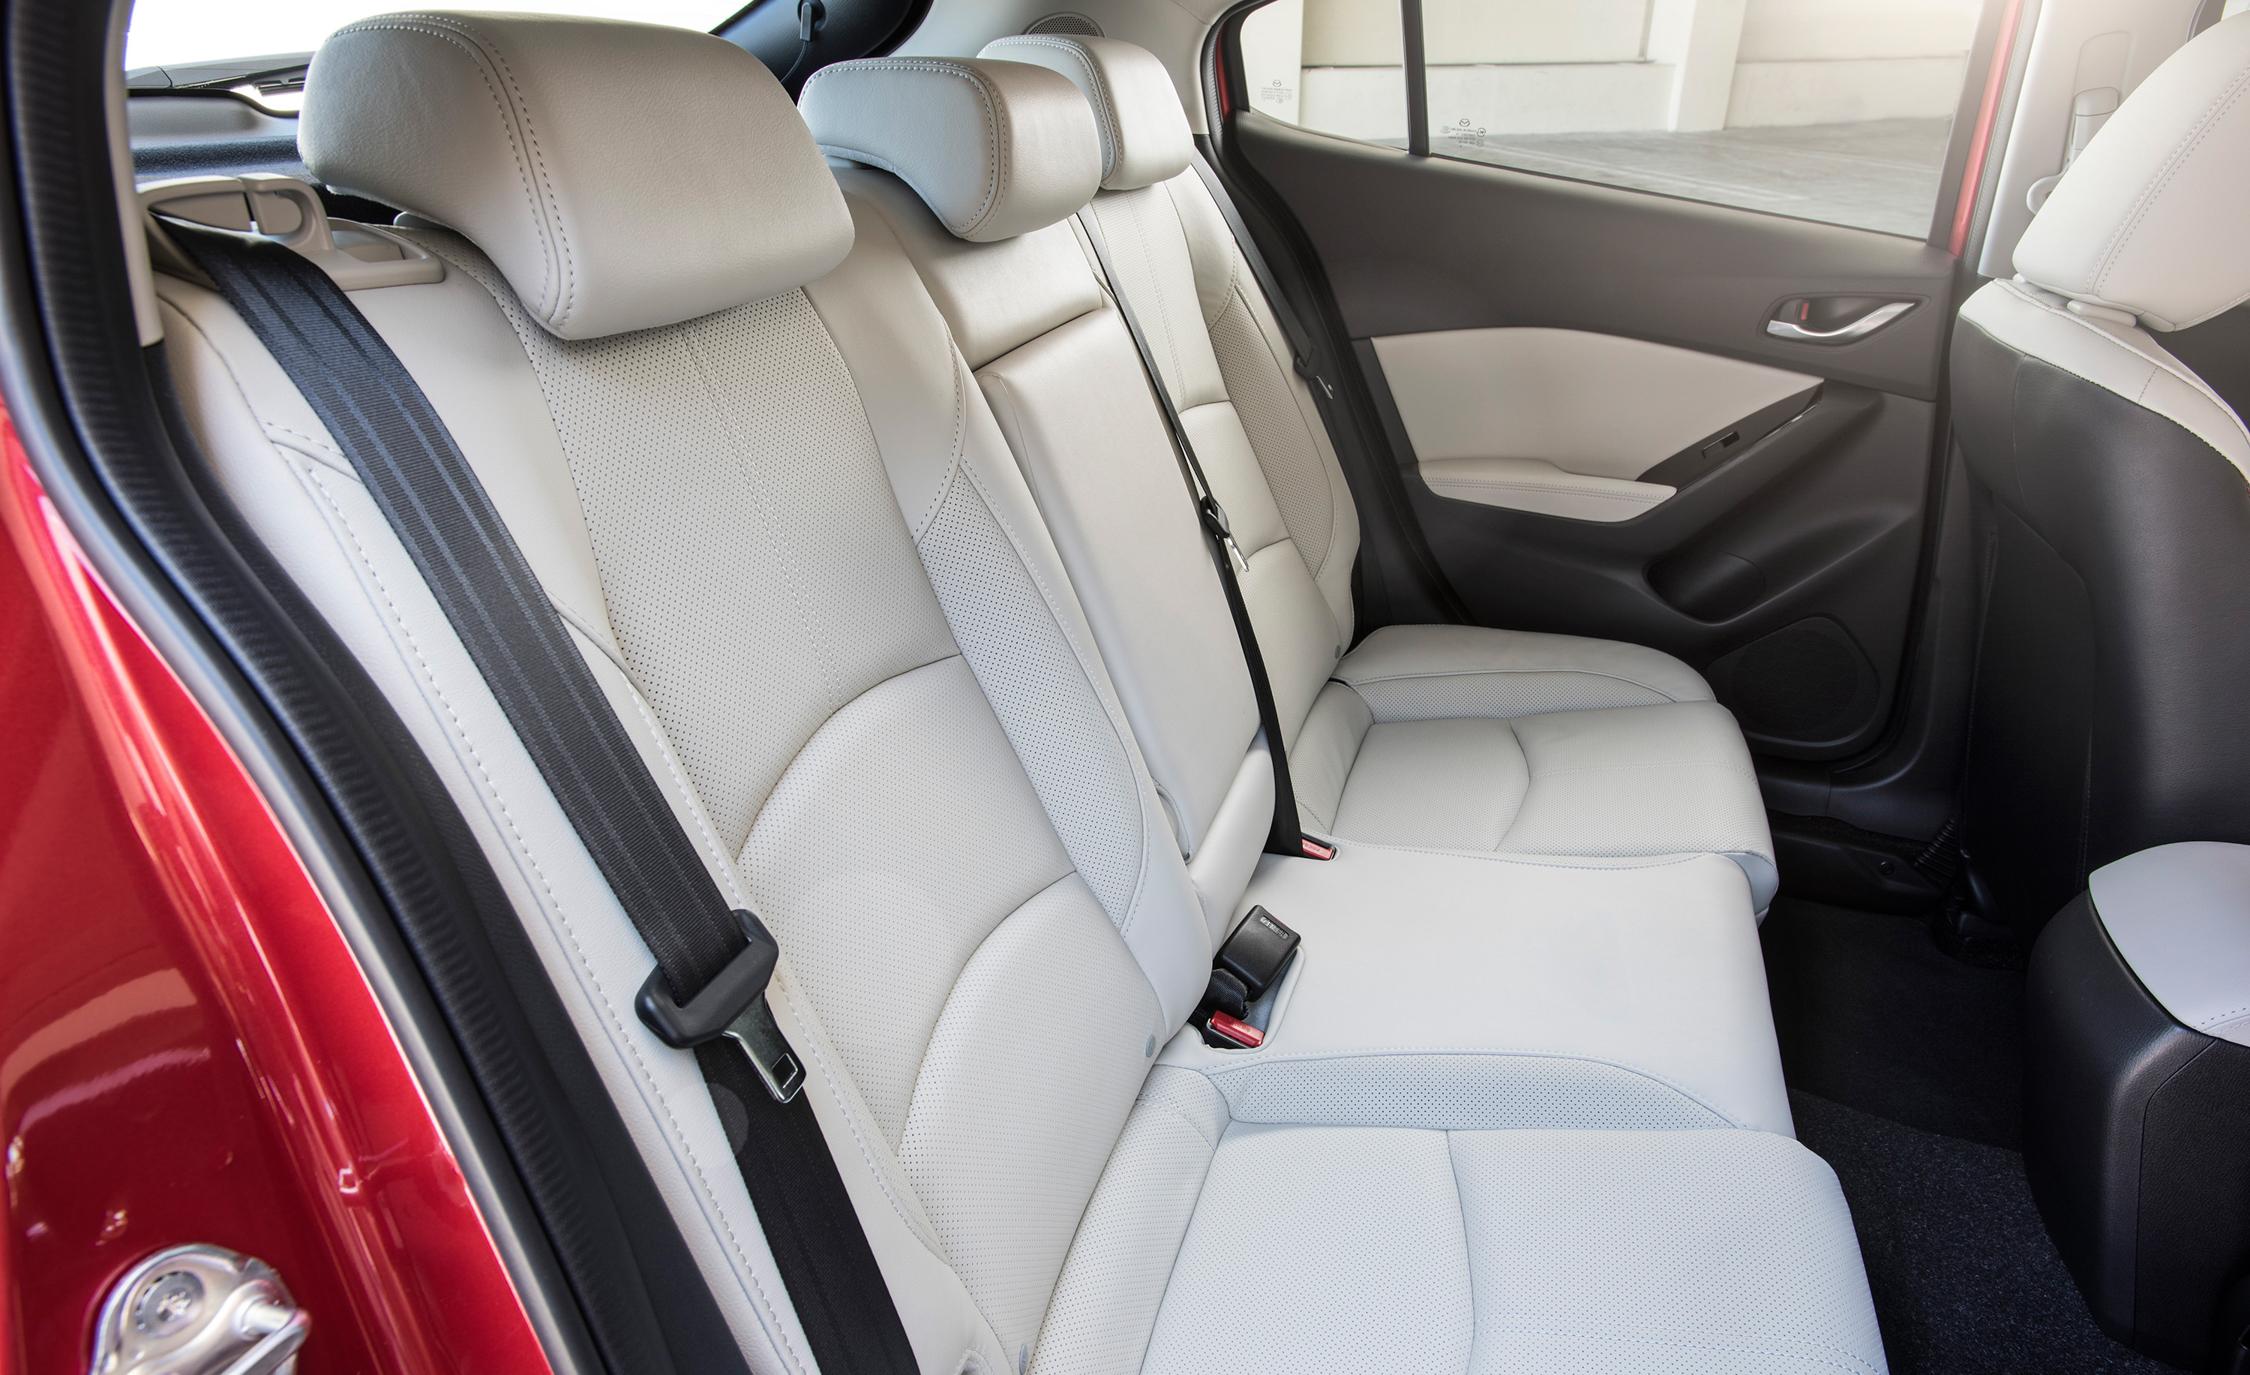 2017 Mazda  (Photo 2 of 40)